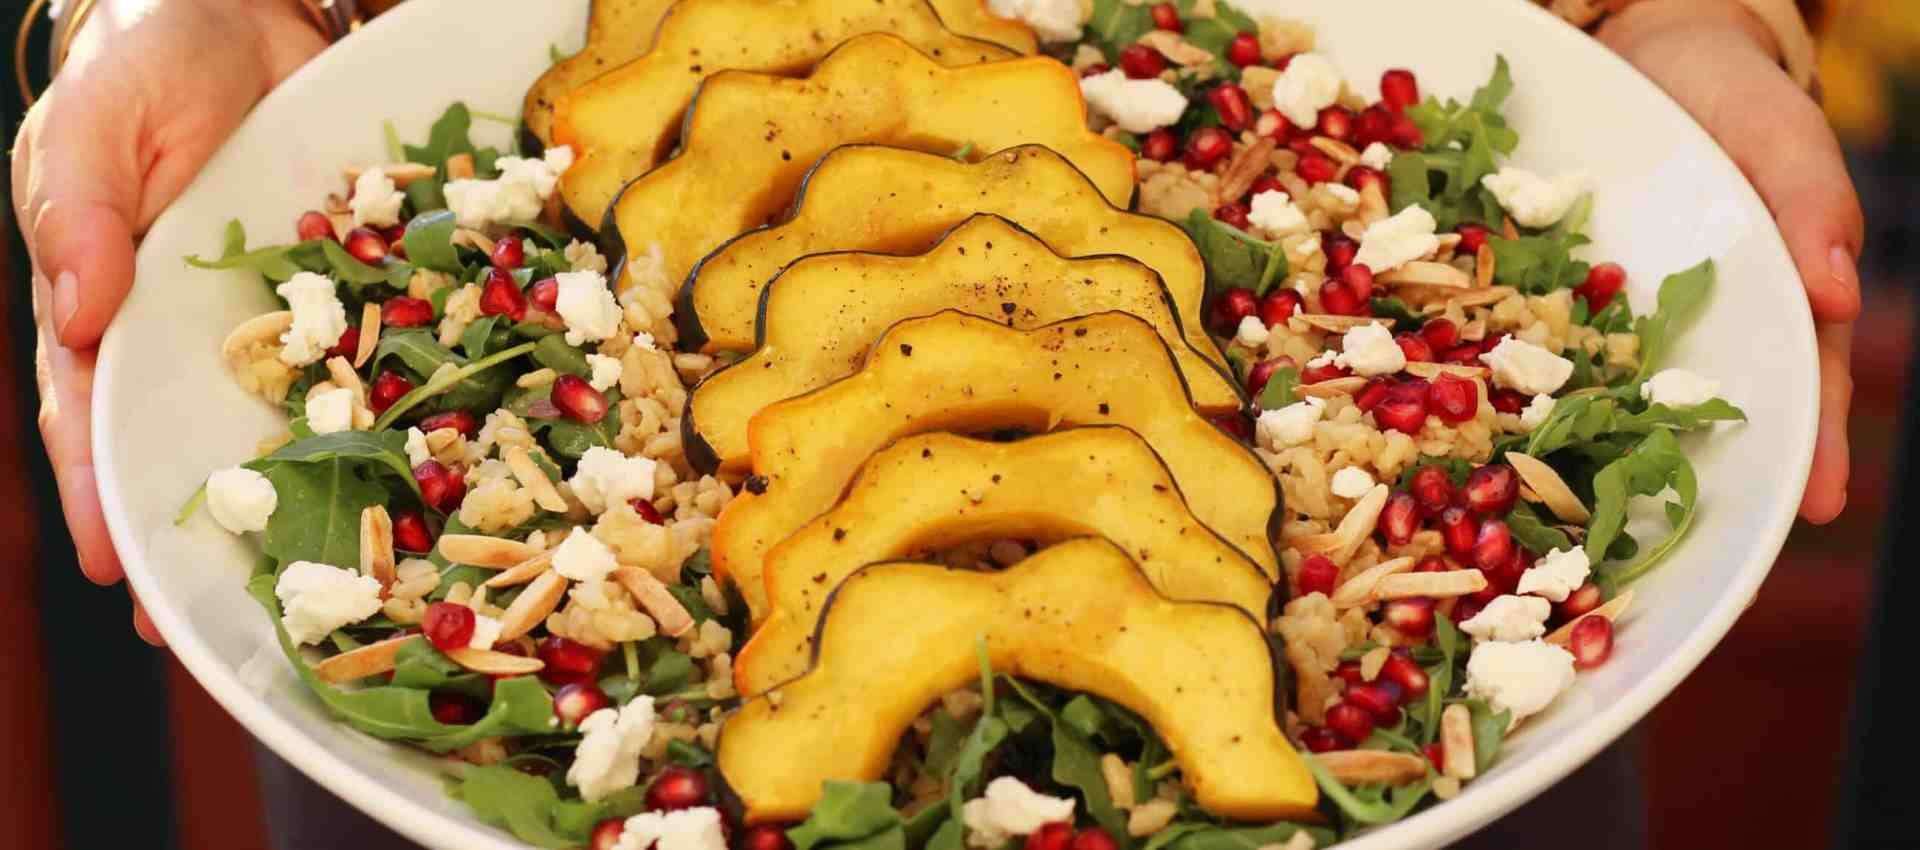 roasted acorn squash recipe, squash salad recipe, salad recipe, fall salad